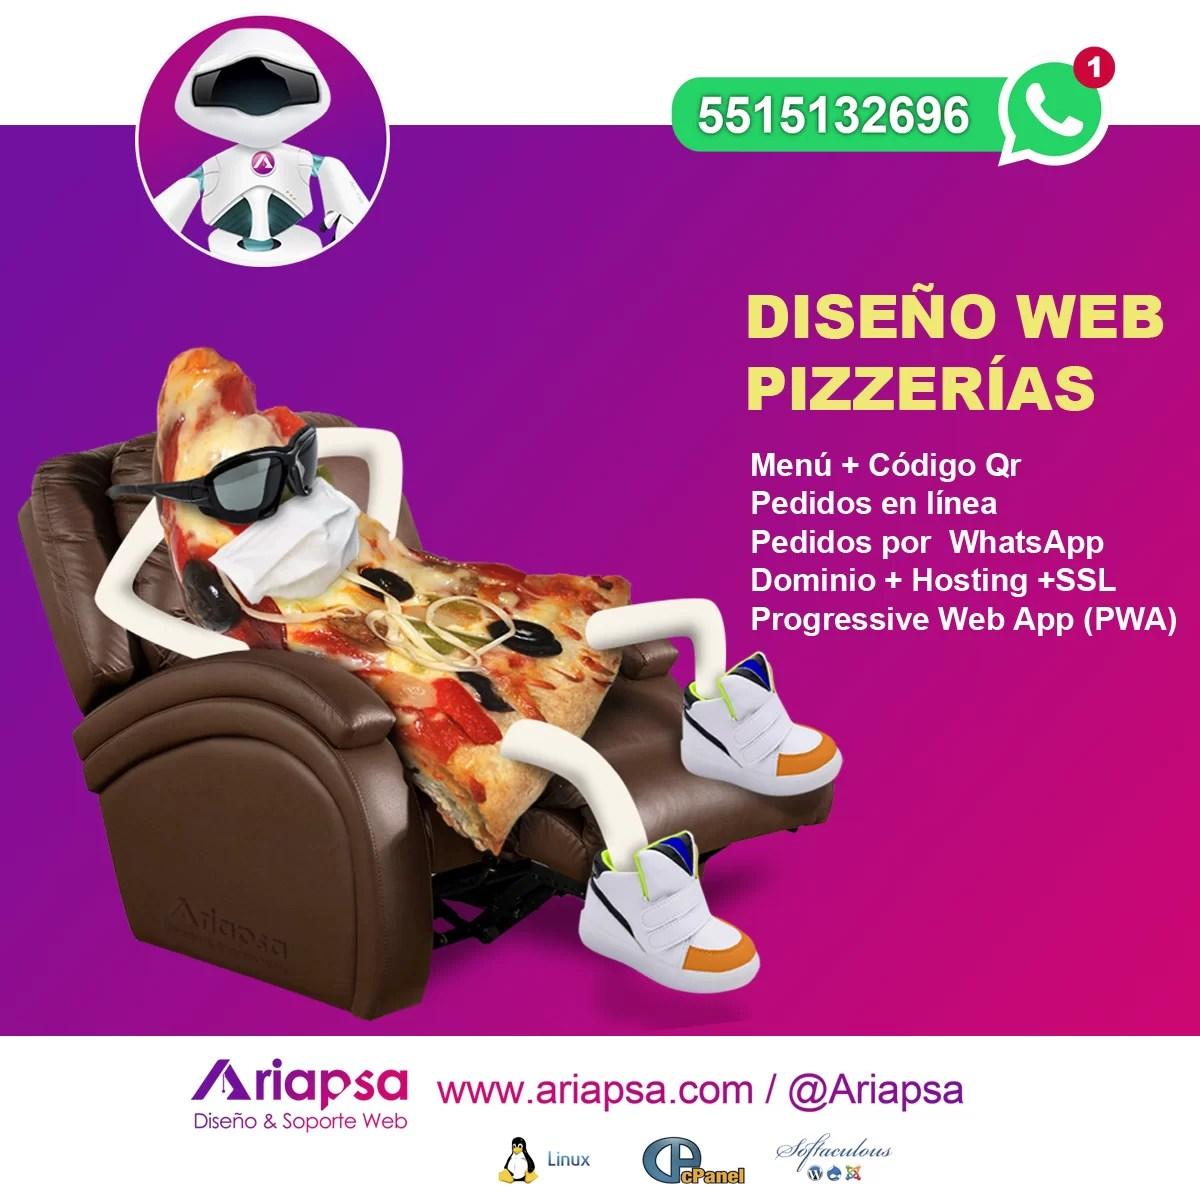 Diseño web pizzerias Ariapsa México 3